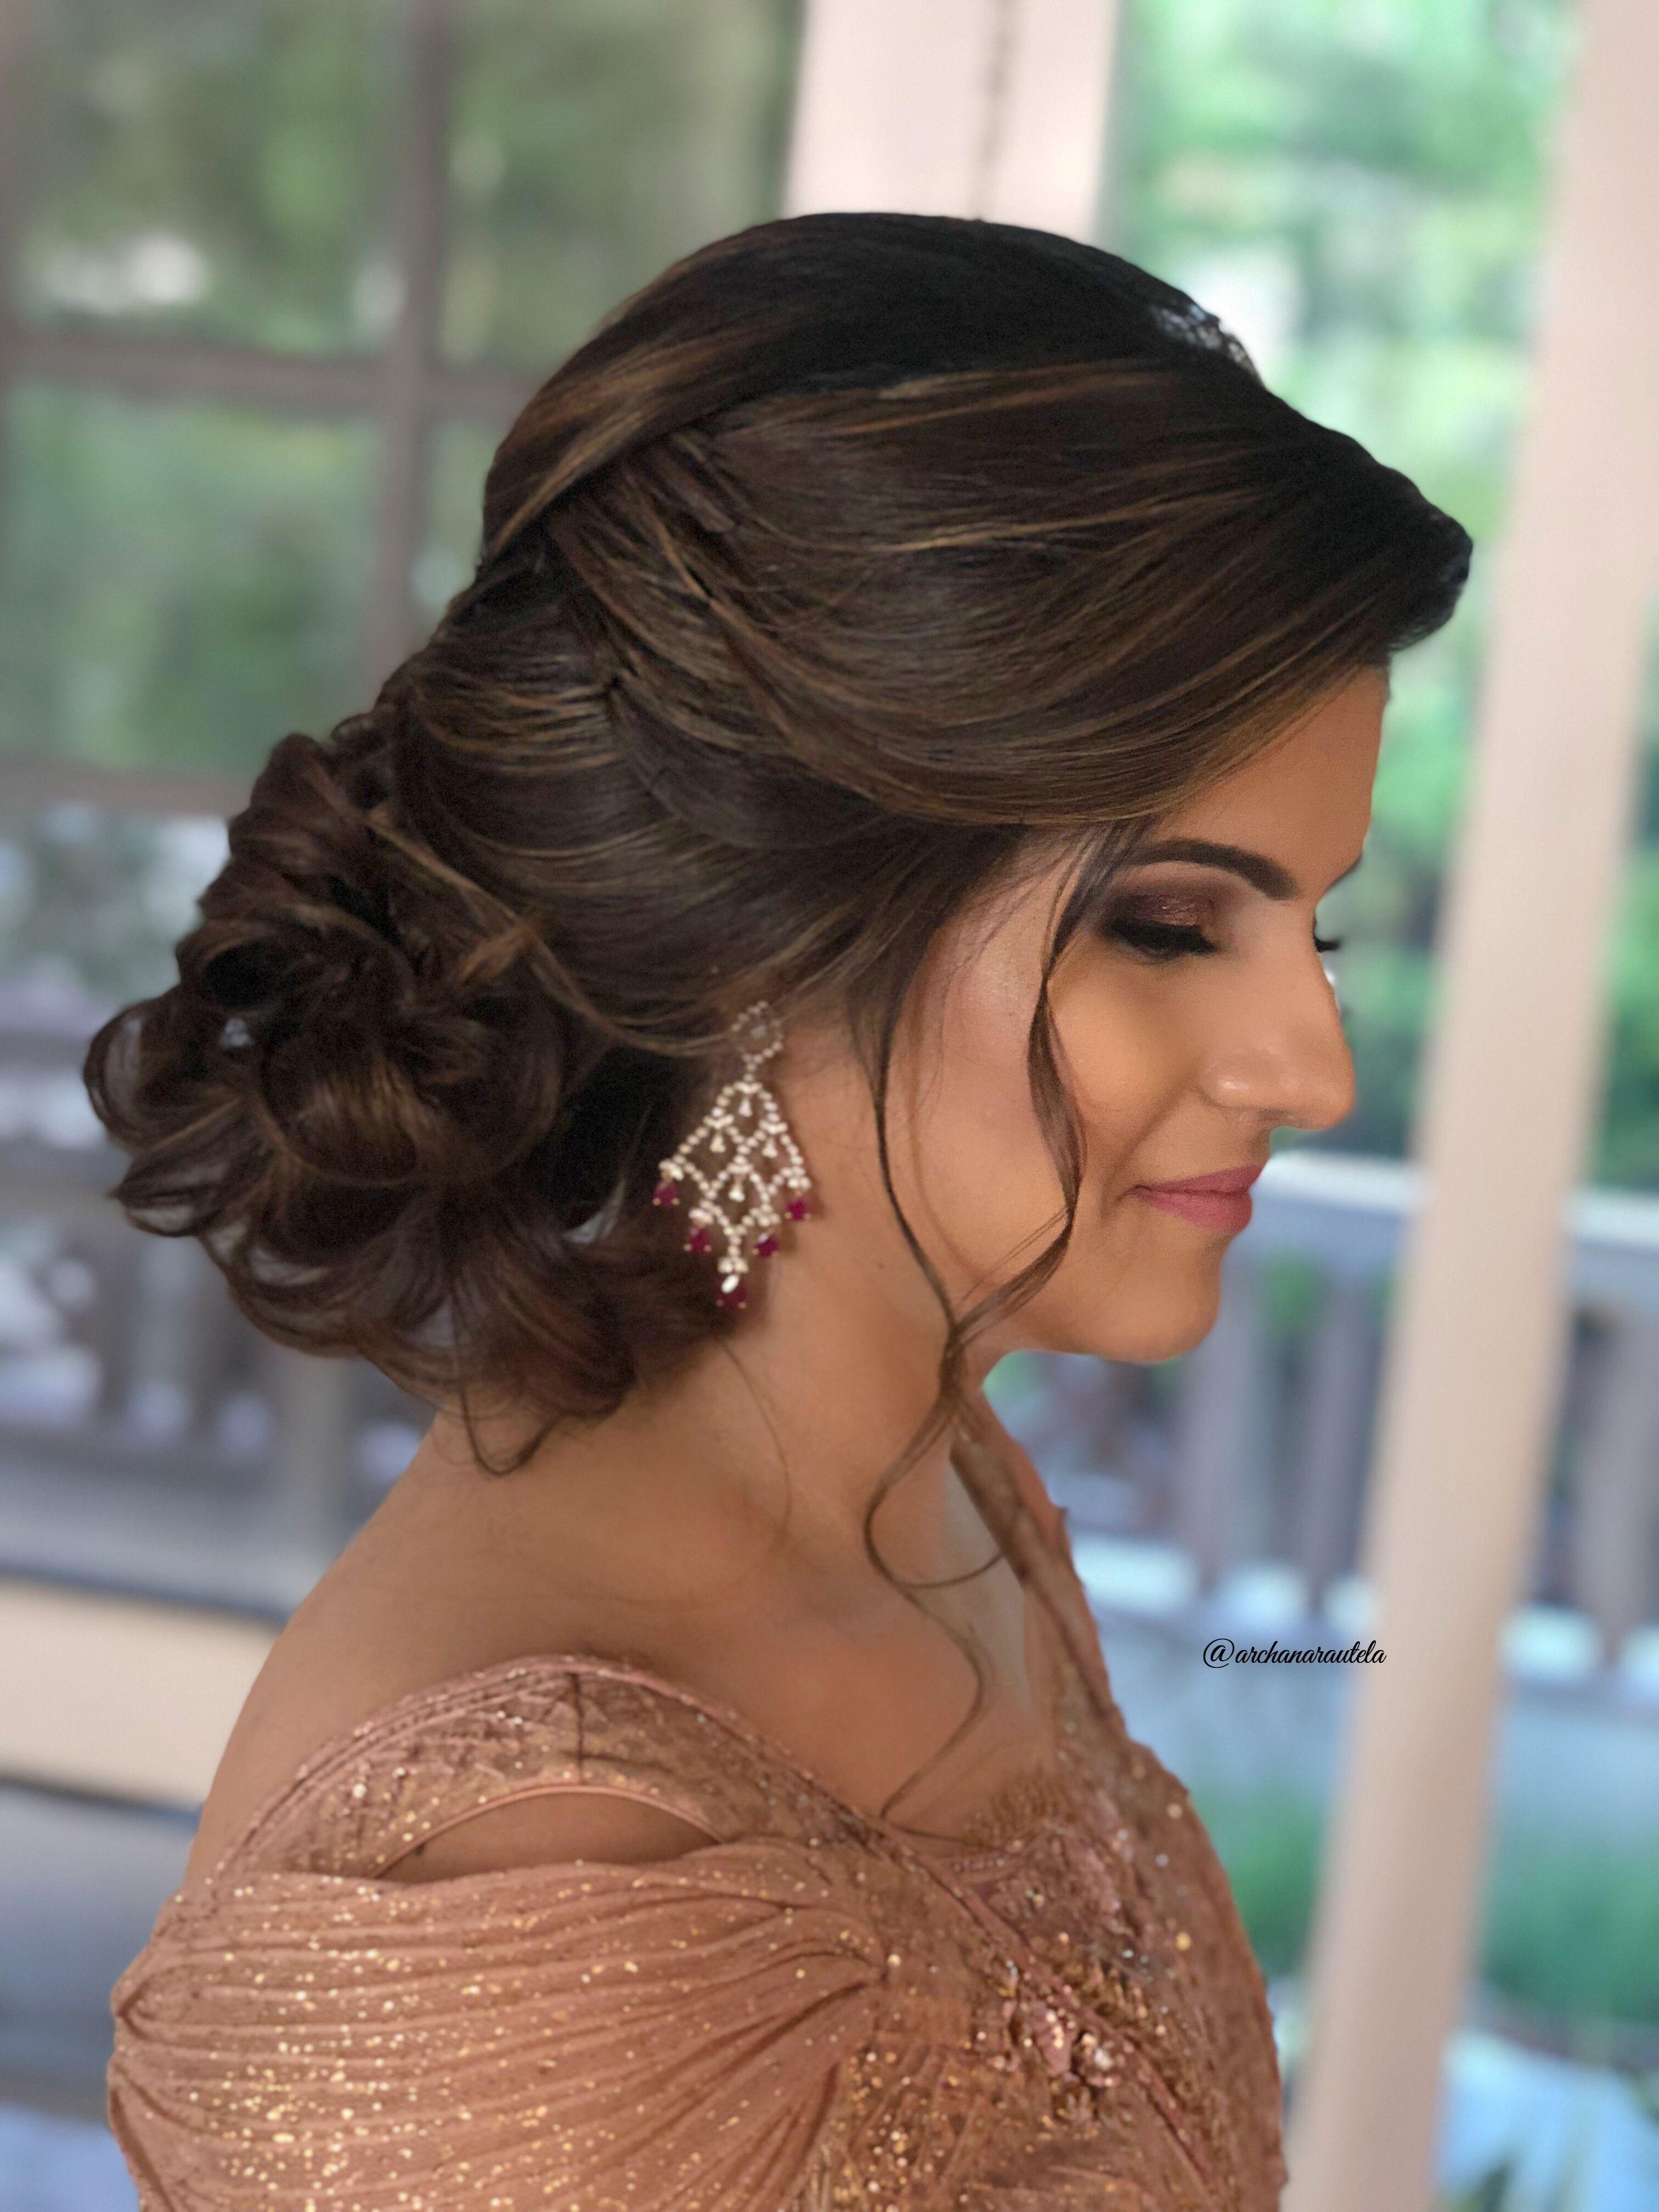 Elegance 🌟⭐💋💋⭐🌟 Hairdo Softly Tied #archanarautelahair pertaining to Indian Party Hairstyles For Medium Length Hair